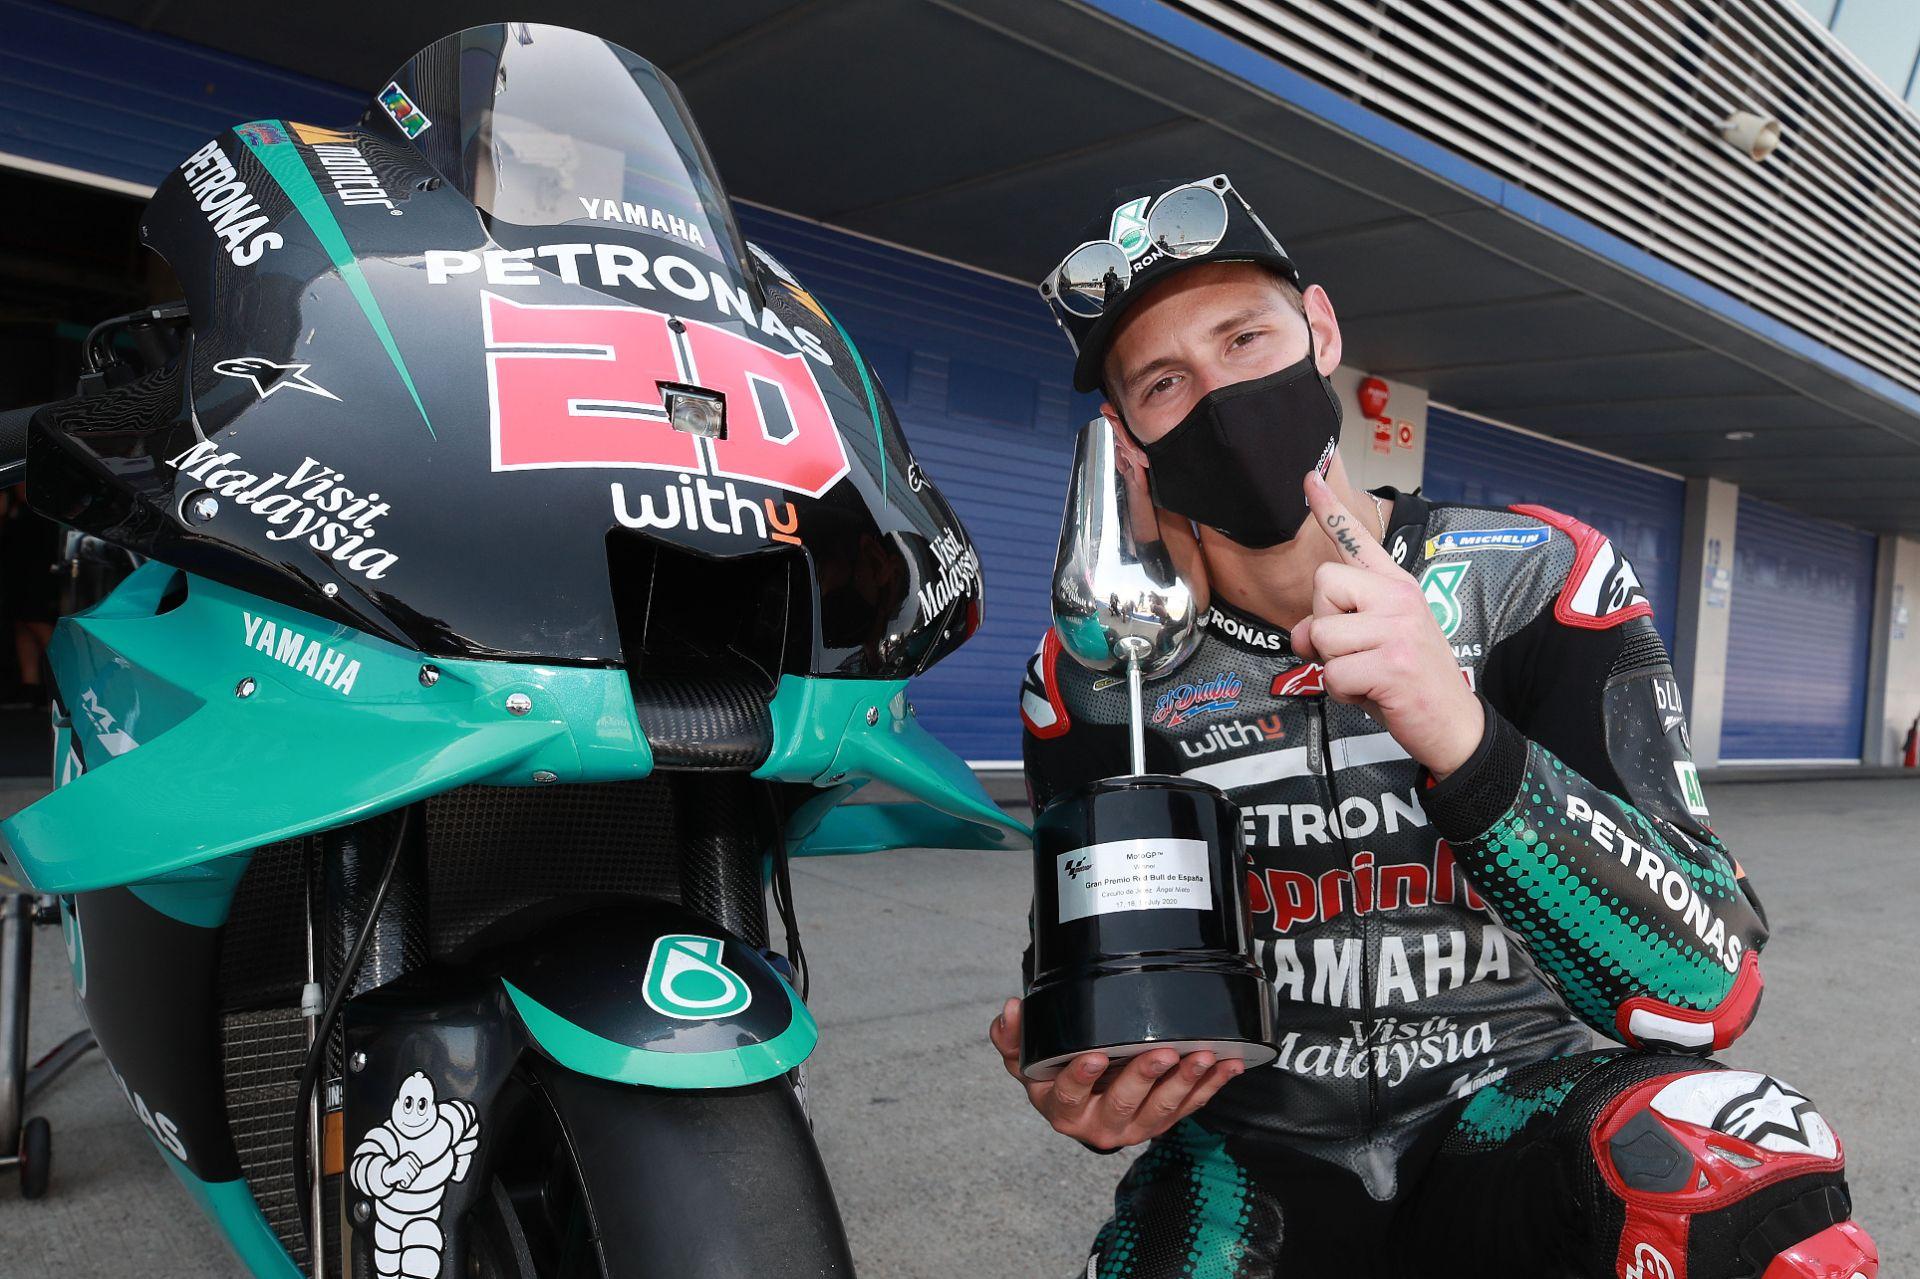 Fabio Quartararo Takes First Motogp Race Win